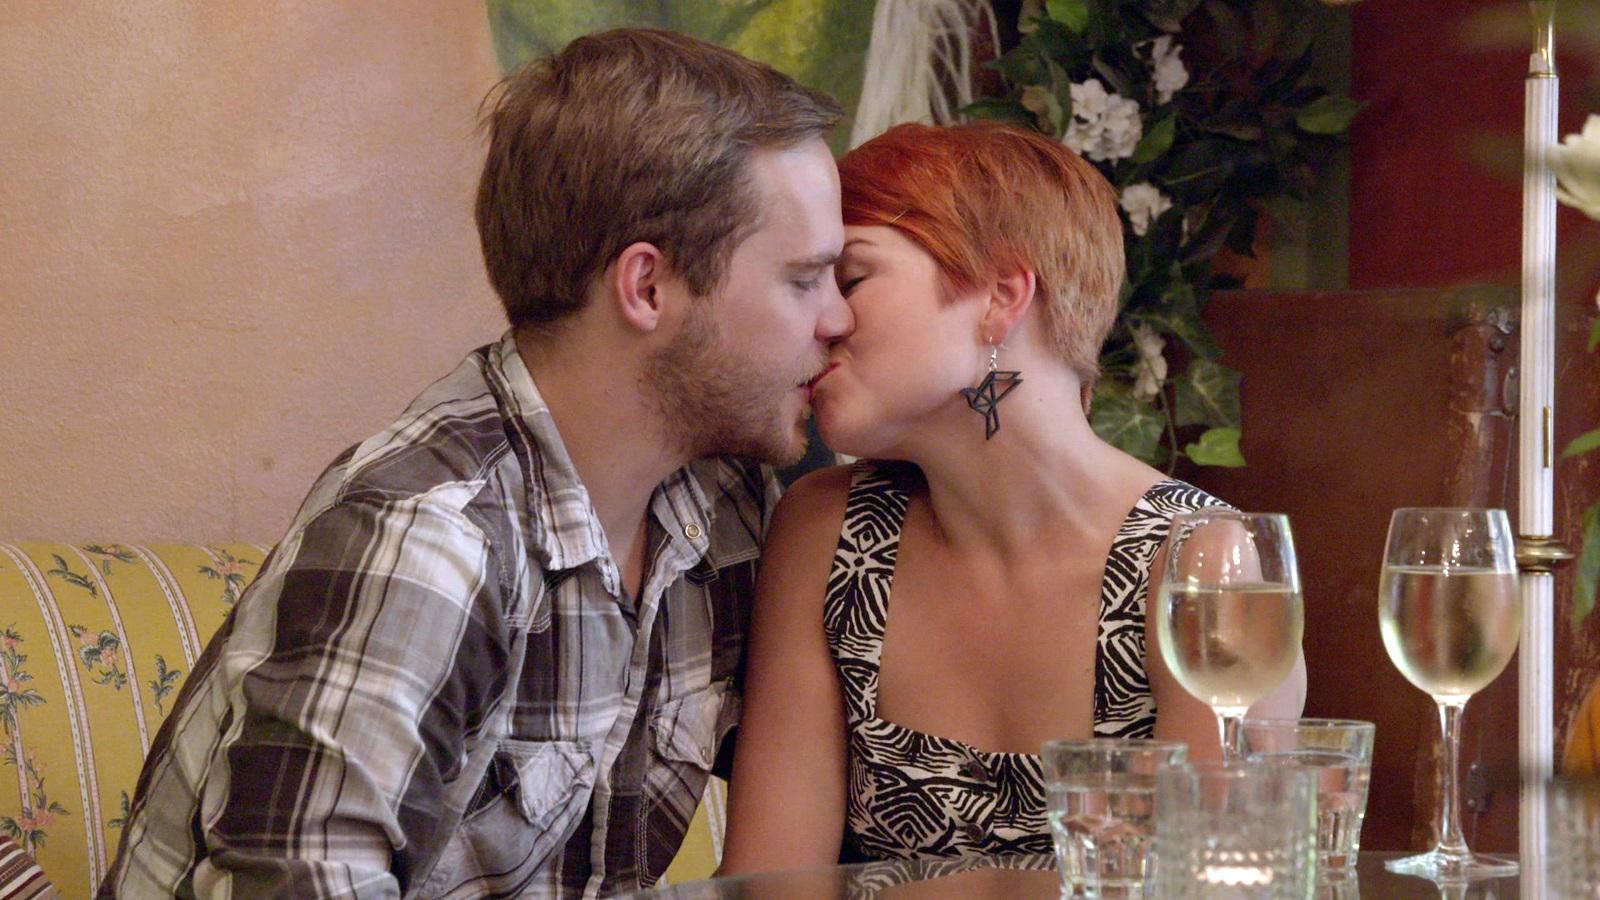 Paras dating site Havaiji